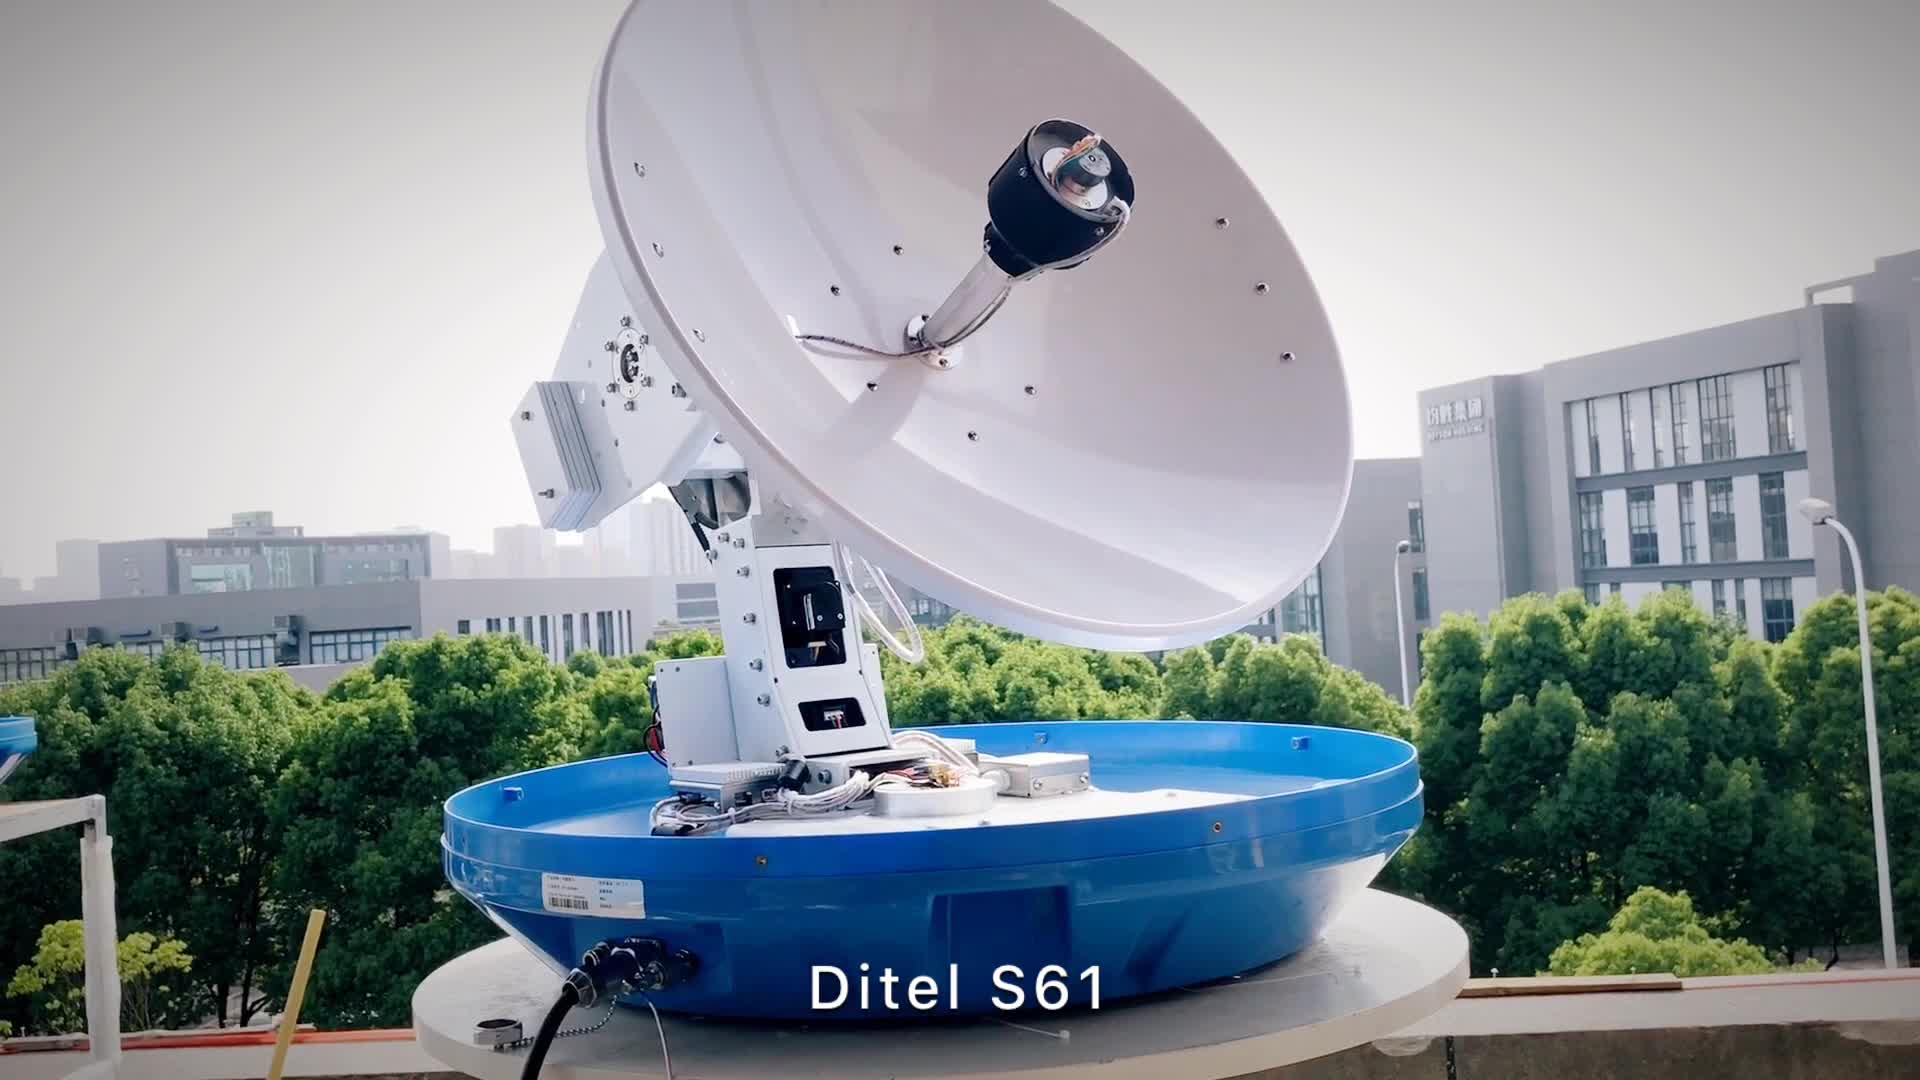 Ditel S61 Europlug outdoor 63cm clear wireless marine satellite tv hdtv digit antenna digital receiver auto for television